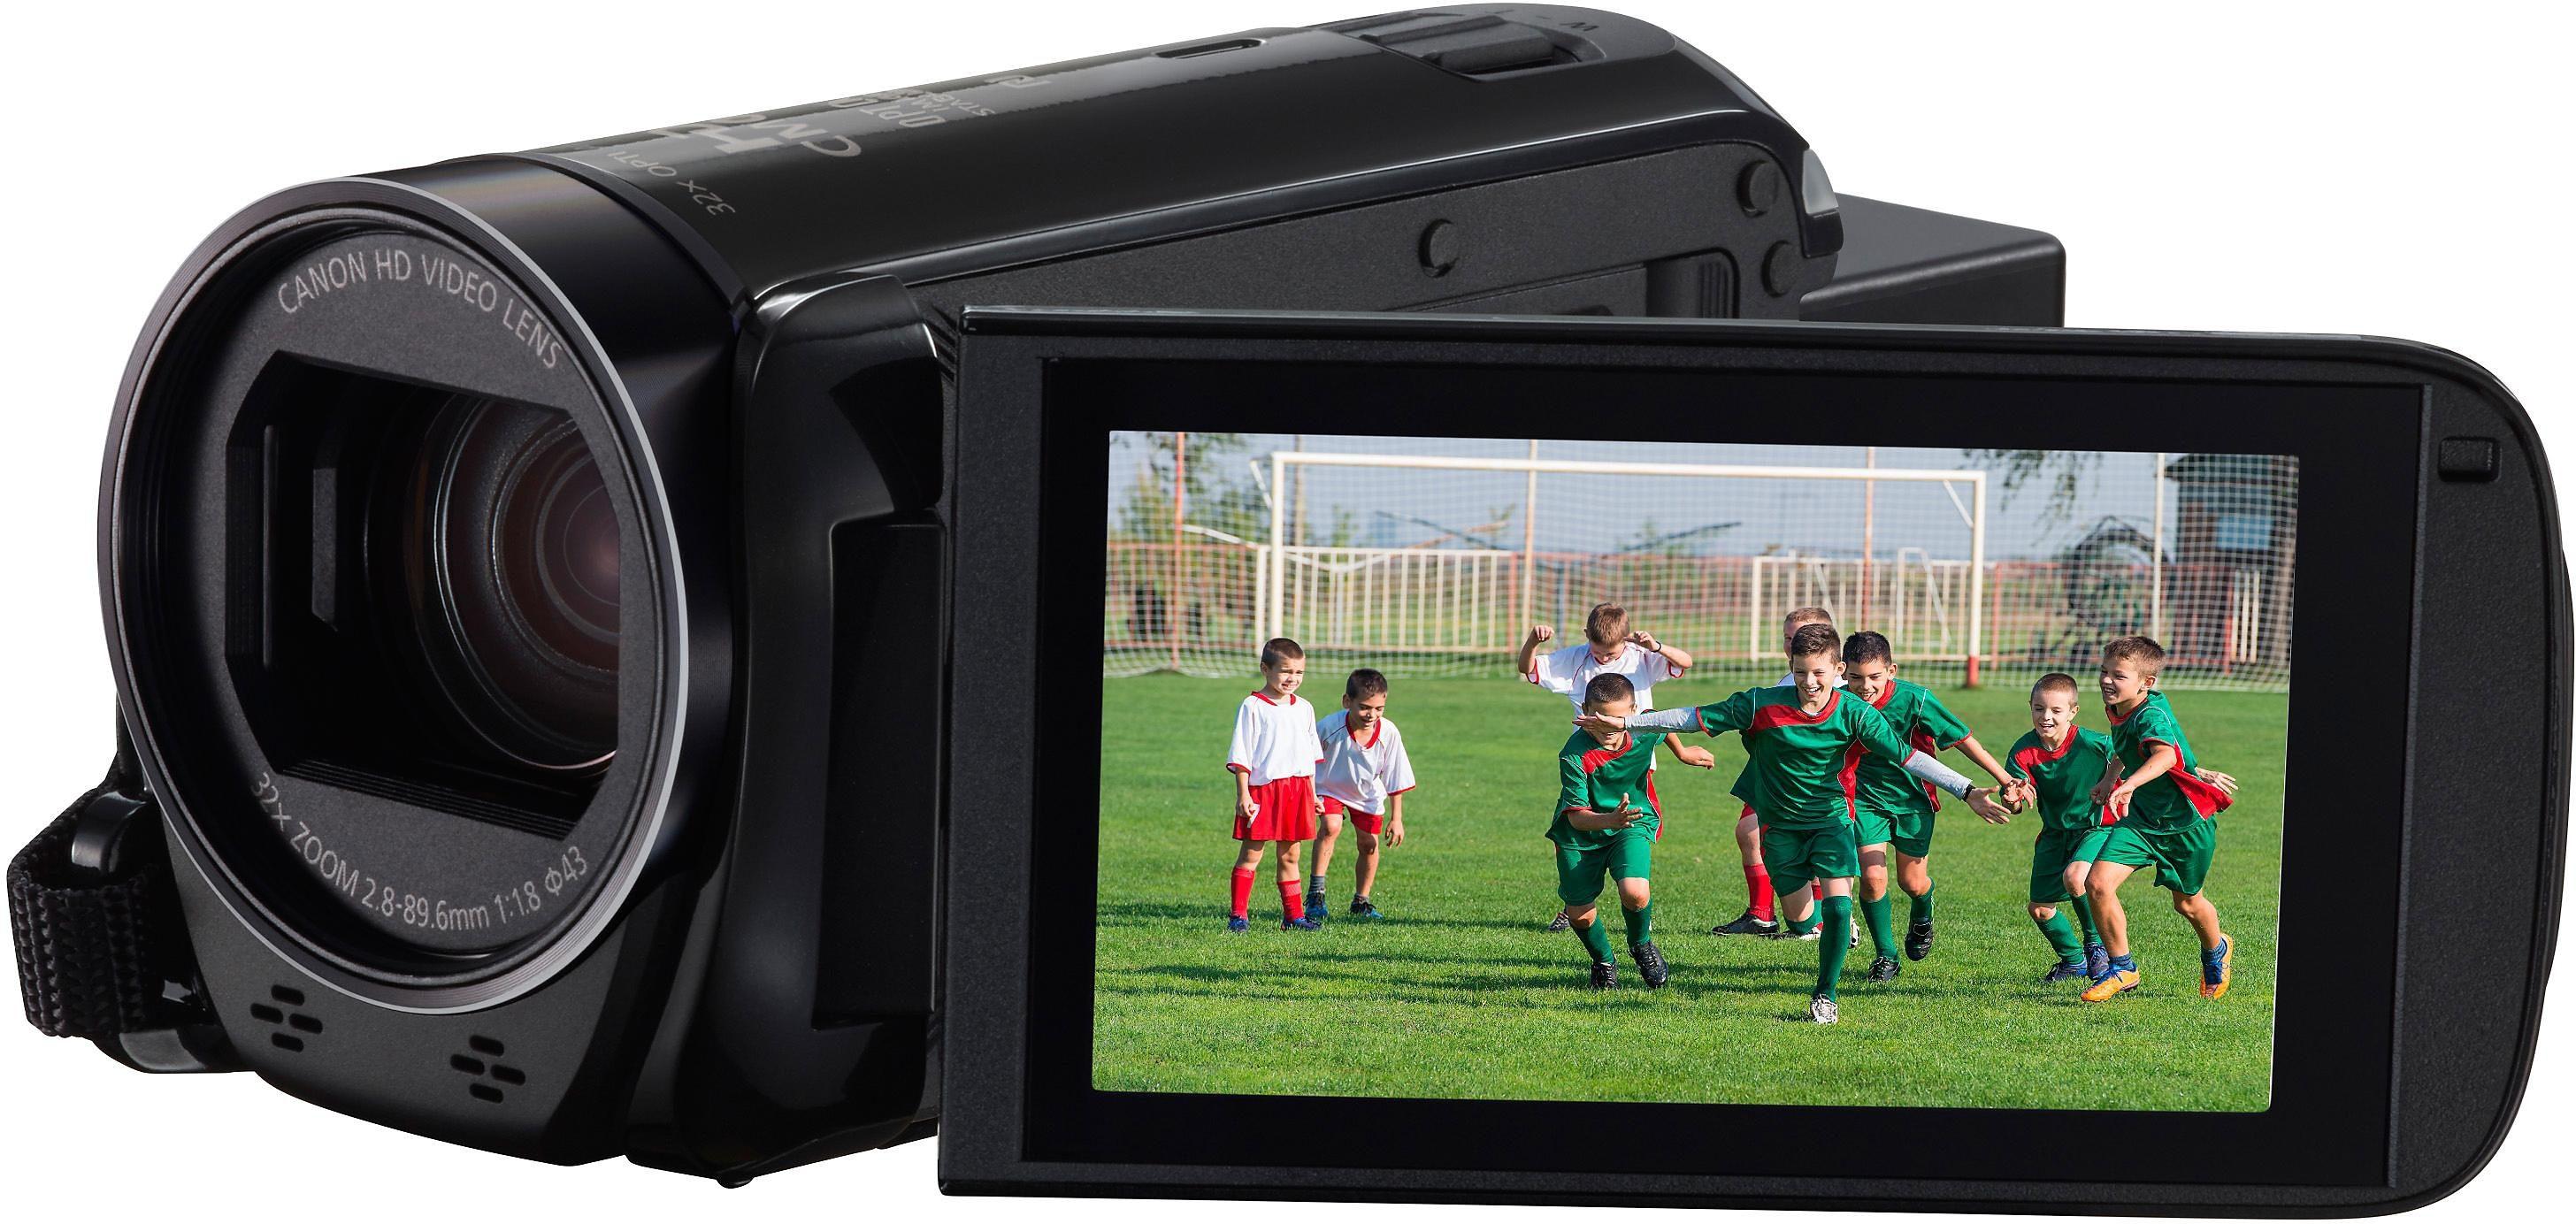 Canon LEGRIA HF-R76 1080p (Full HD) Camcorder, WLAN, NFC